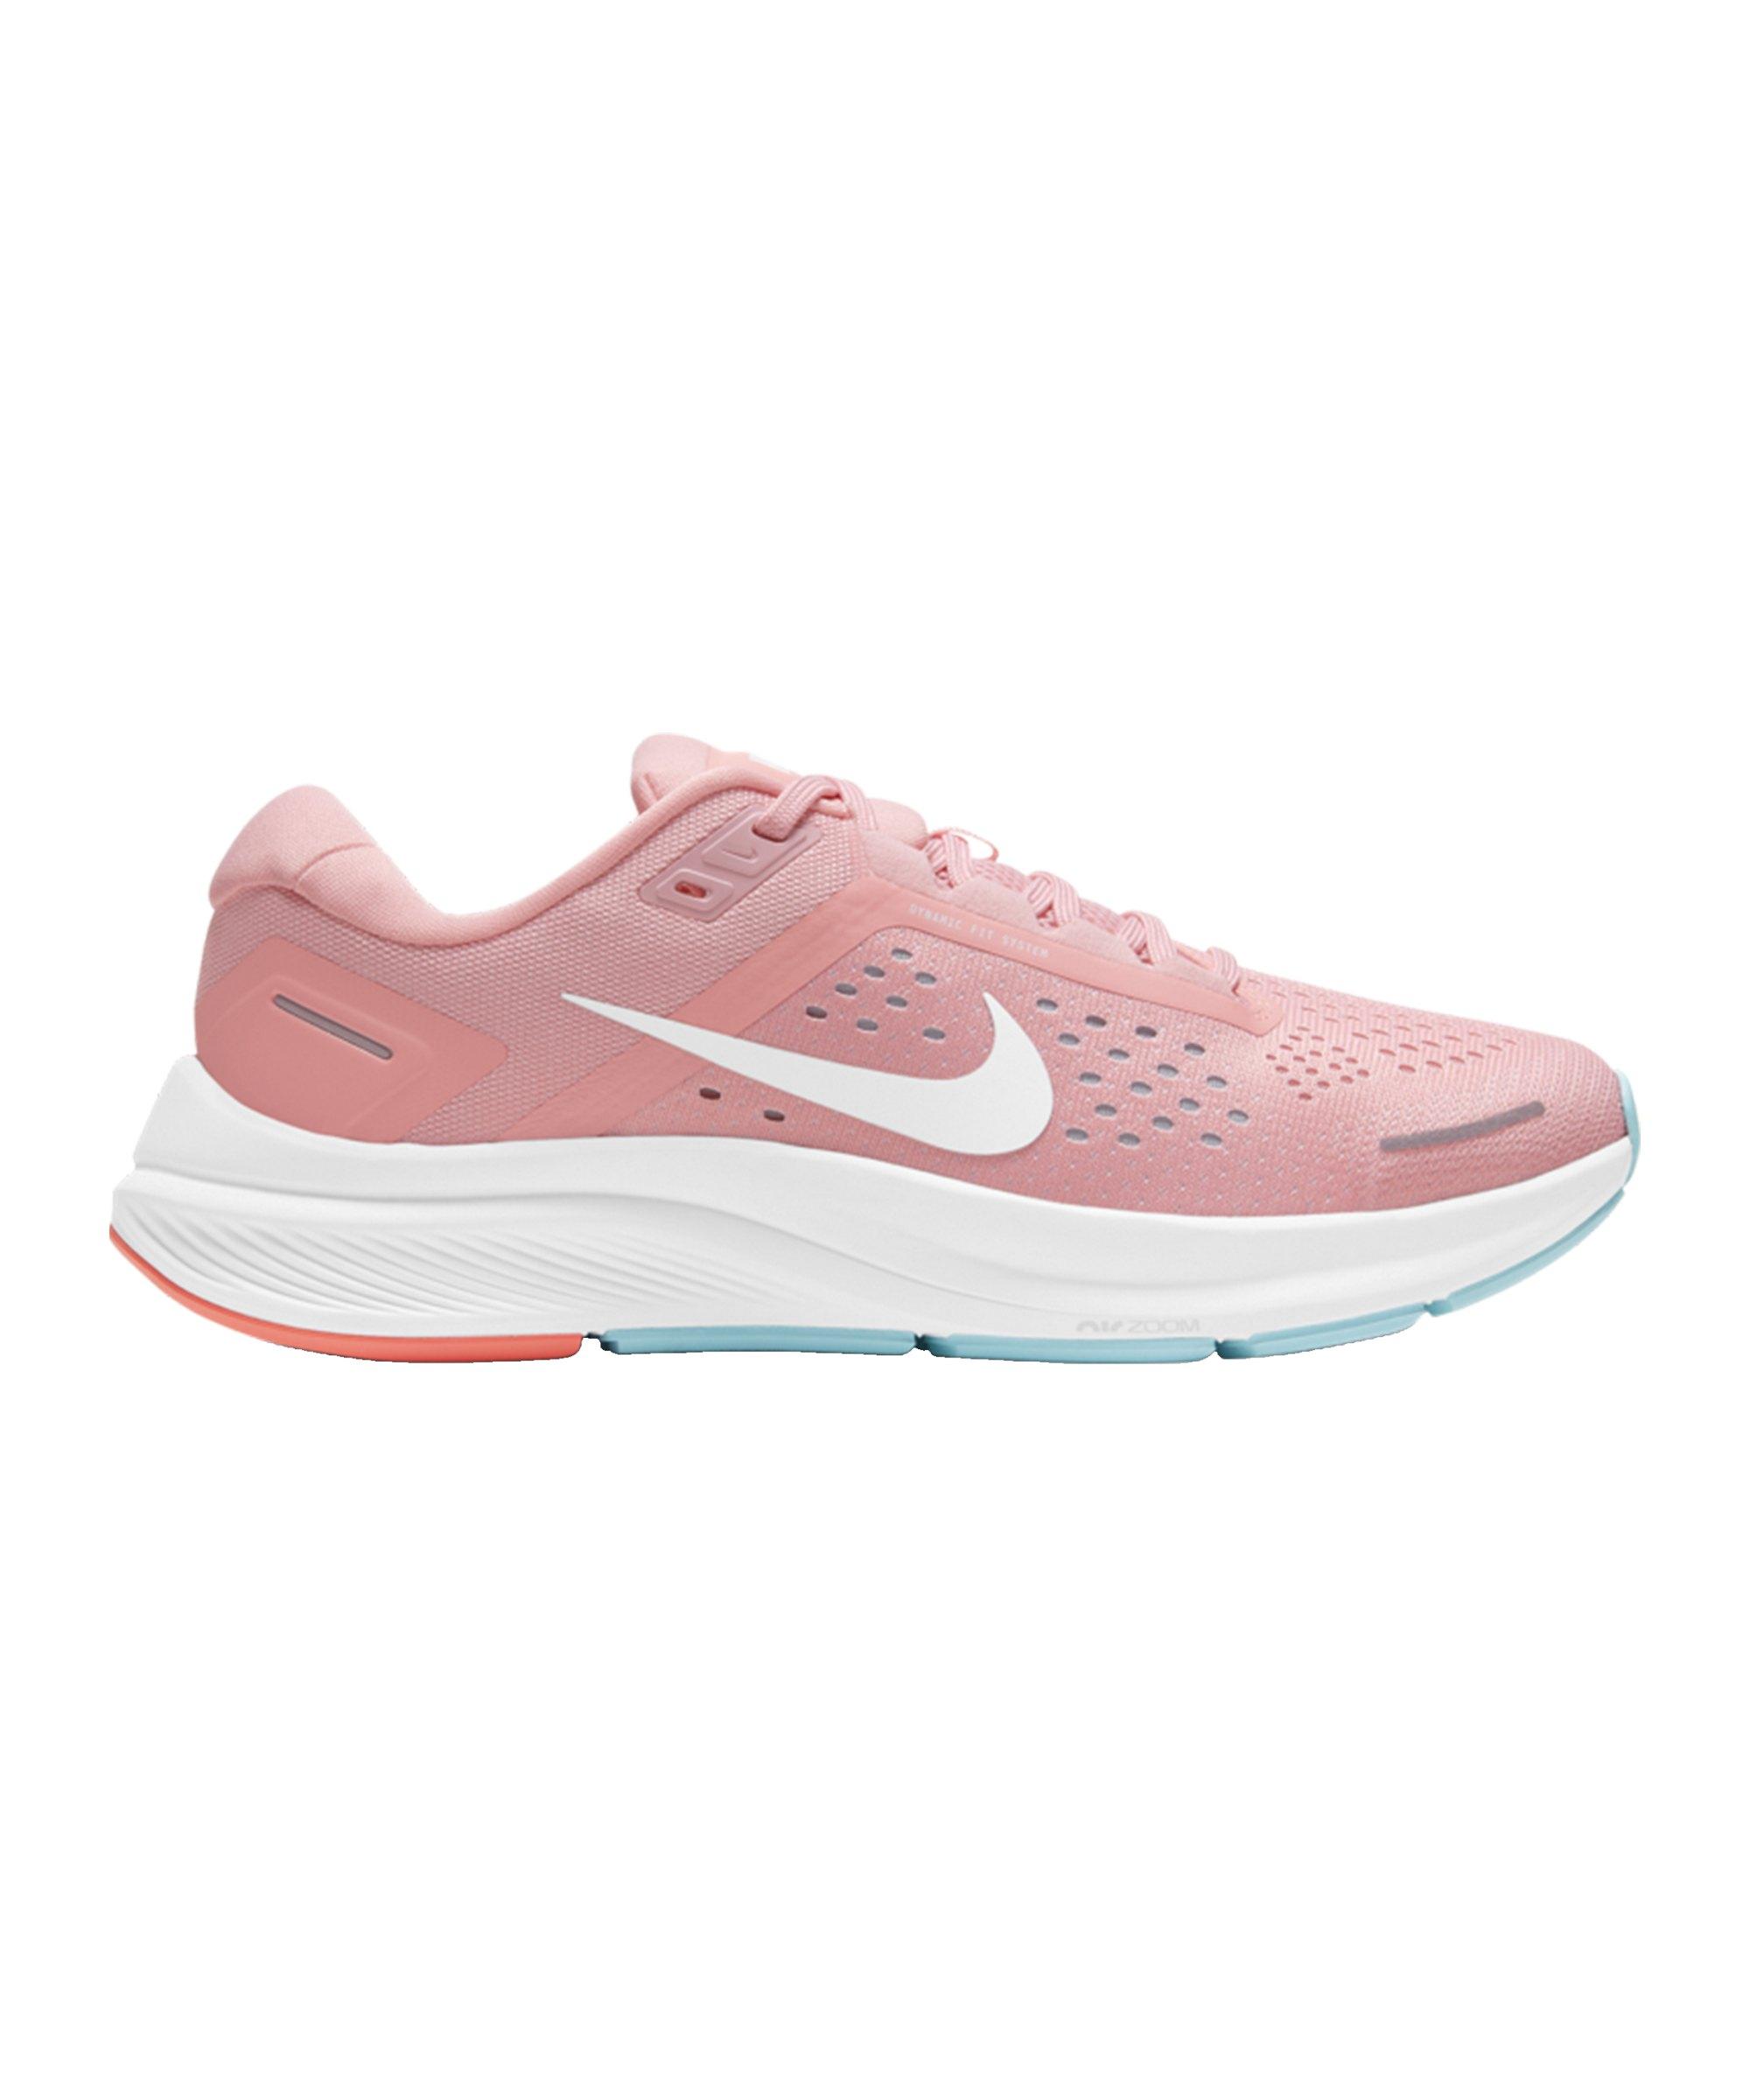 Nike Air Zoom Structure 23 Running Damen F601 - pink